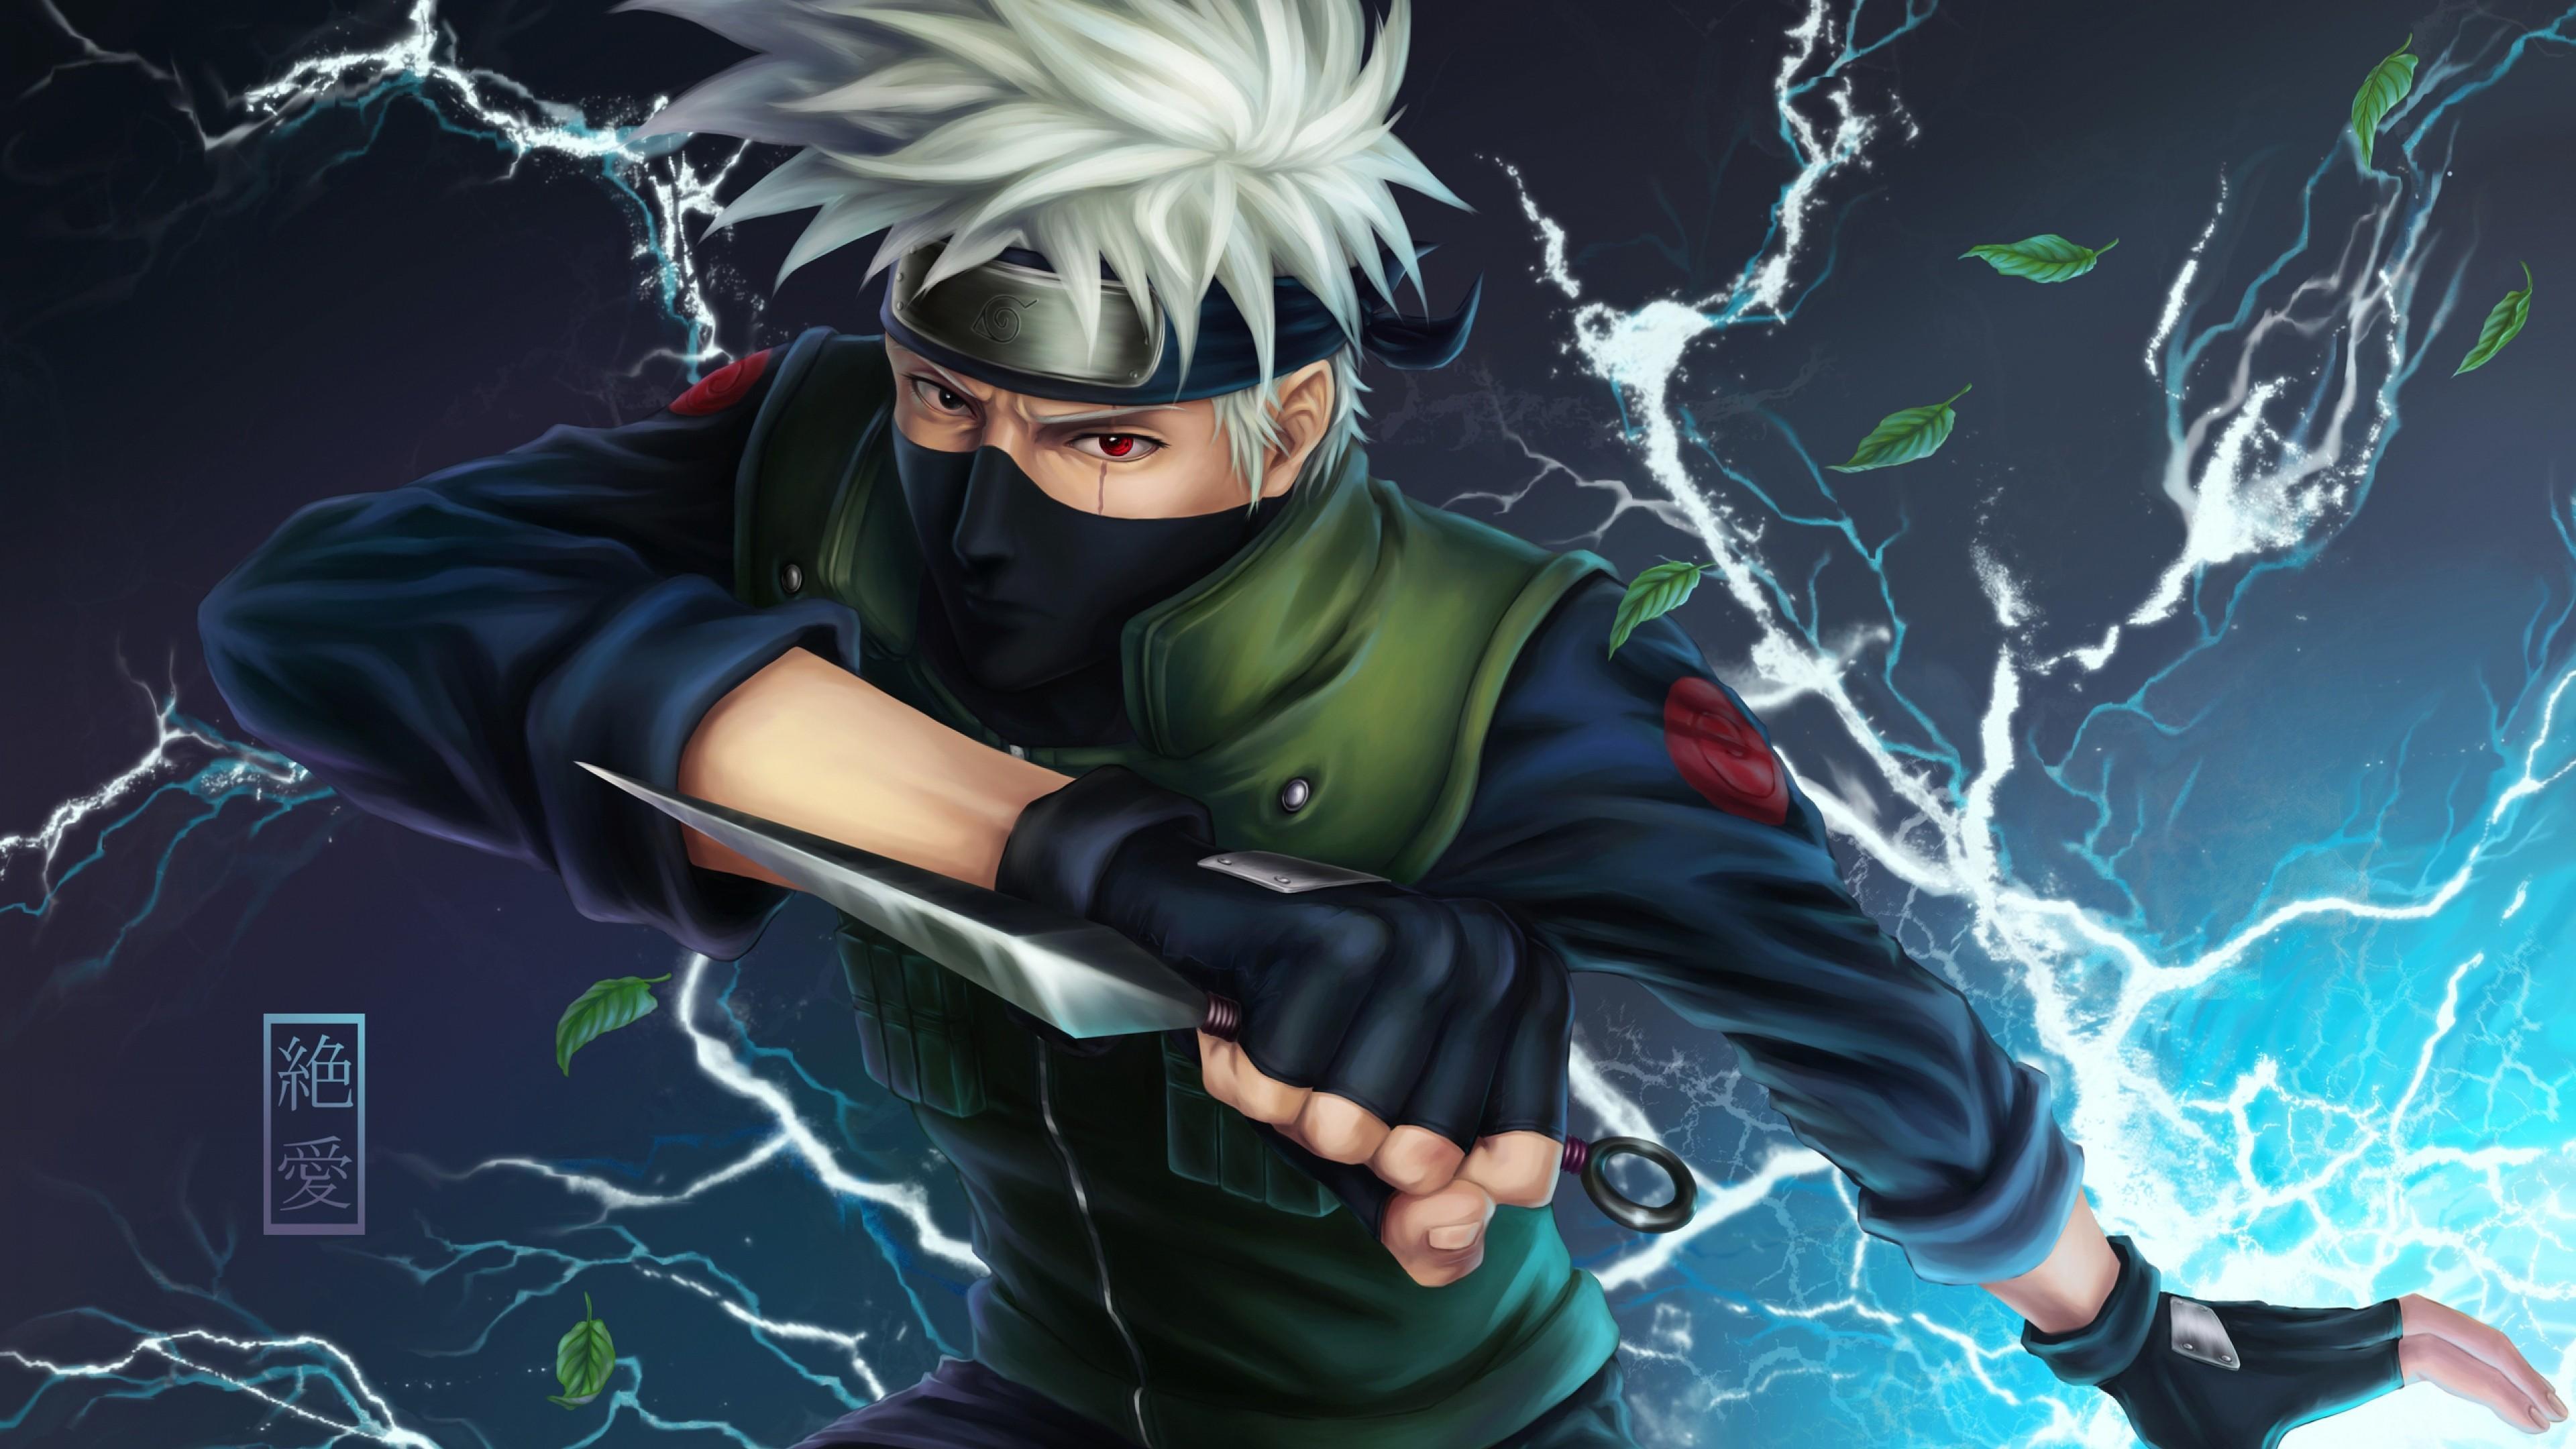 Ultra 4k Naruto Wallpapers Top Free Ultra 4k Naruto Backgrounds Wallpaperaccess